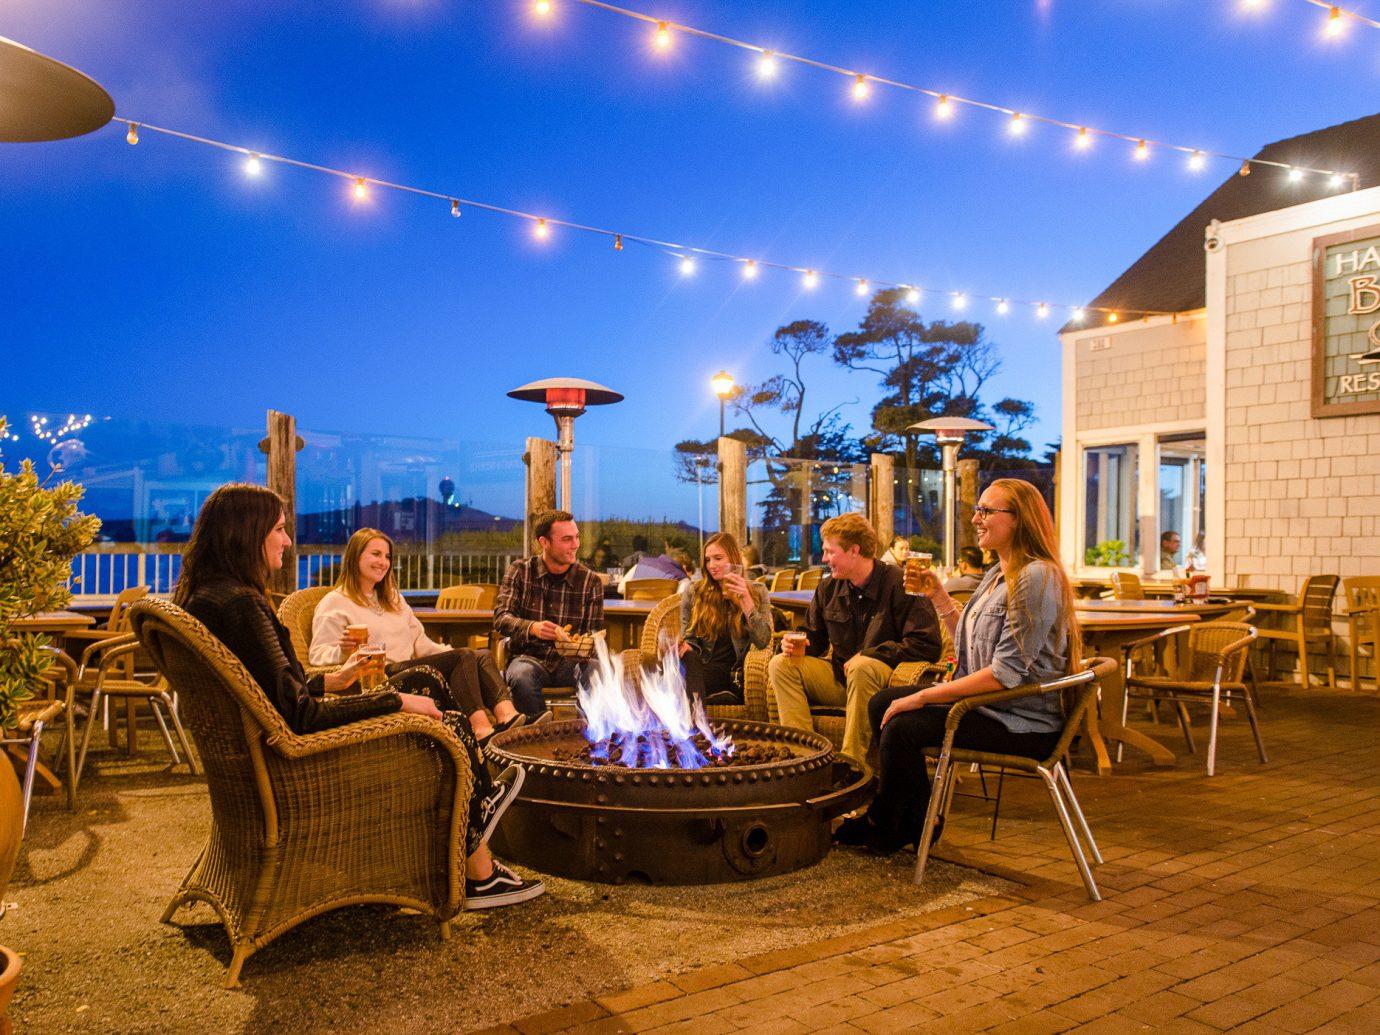 Trip Ideas sky outdoor restaurant real estate leisure tourism interior design Resort several